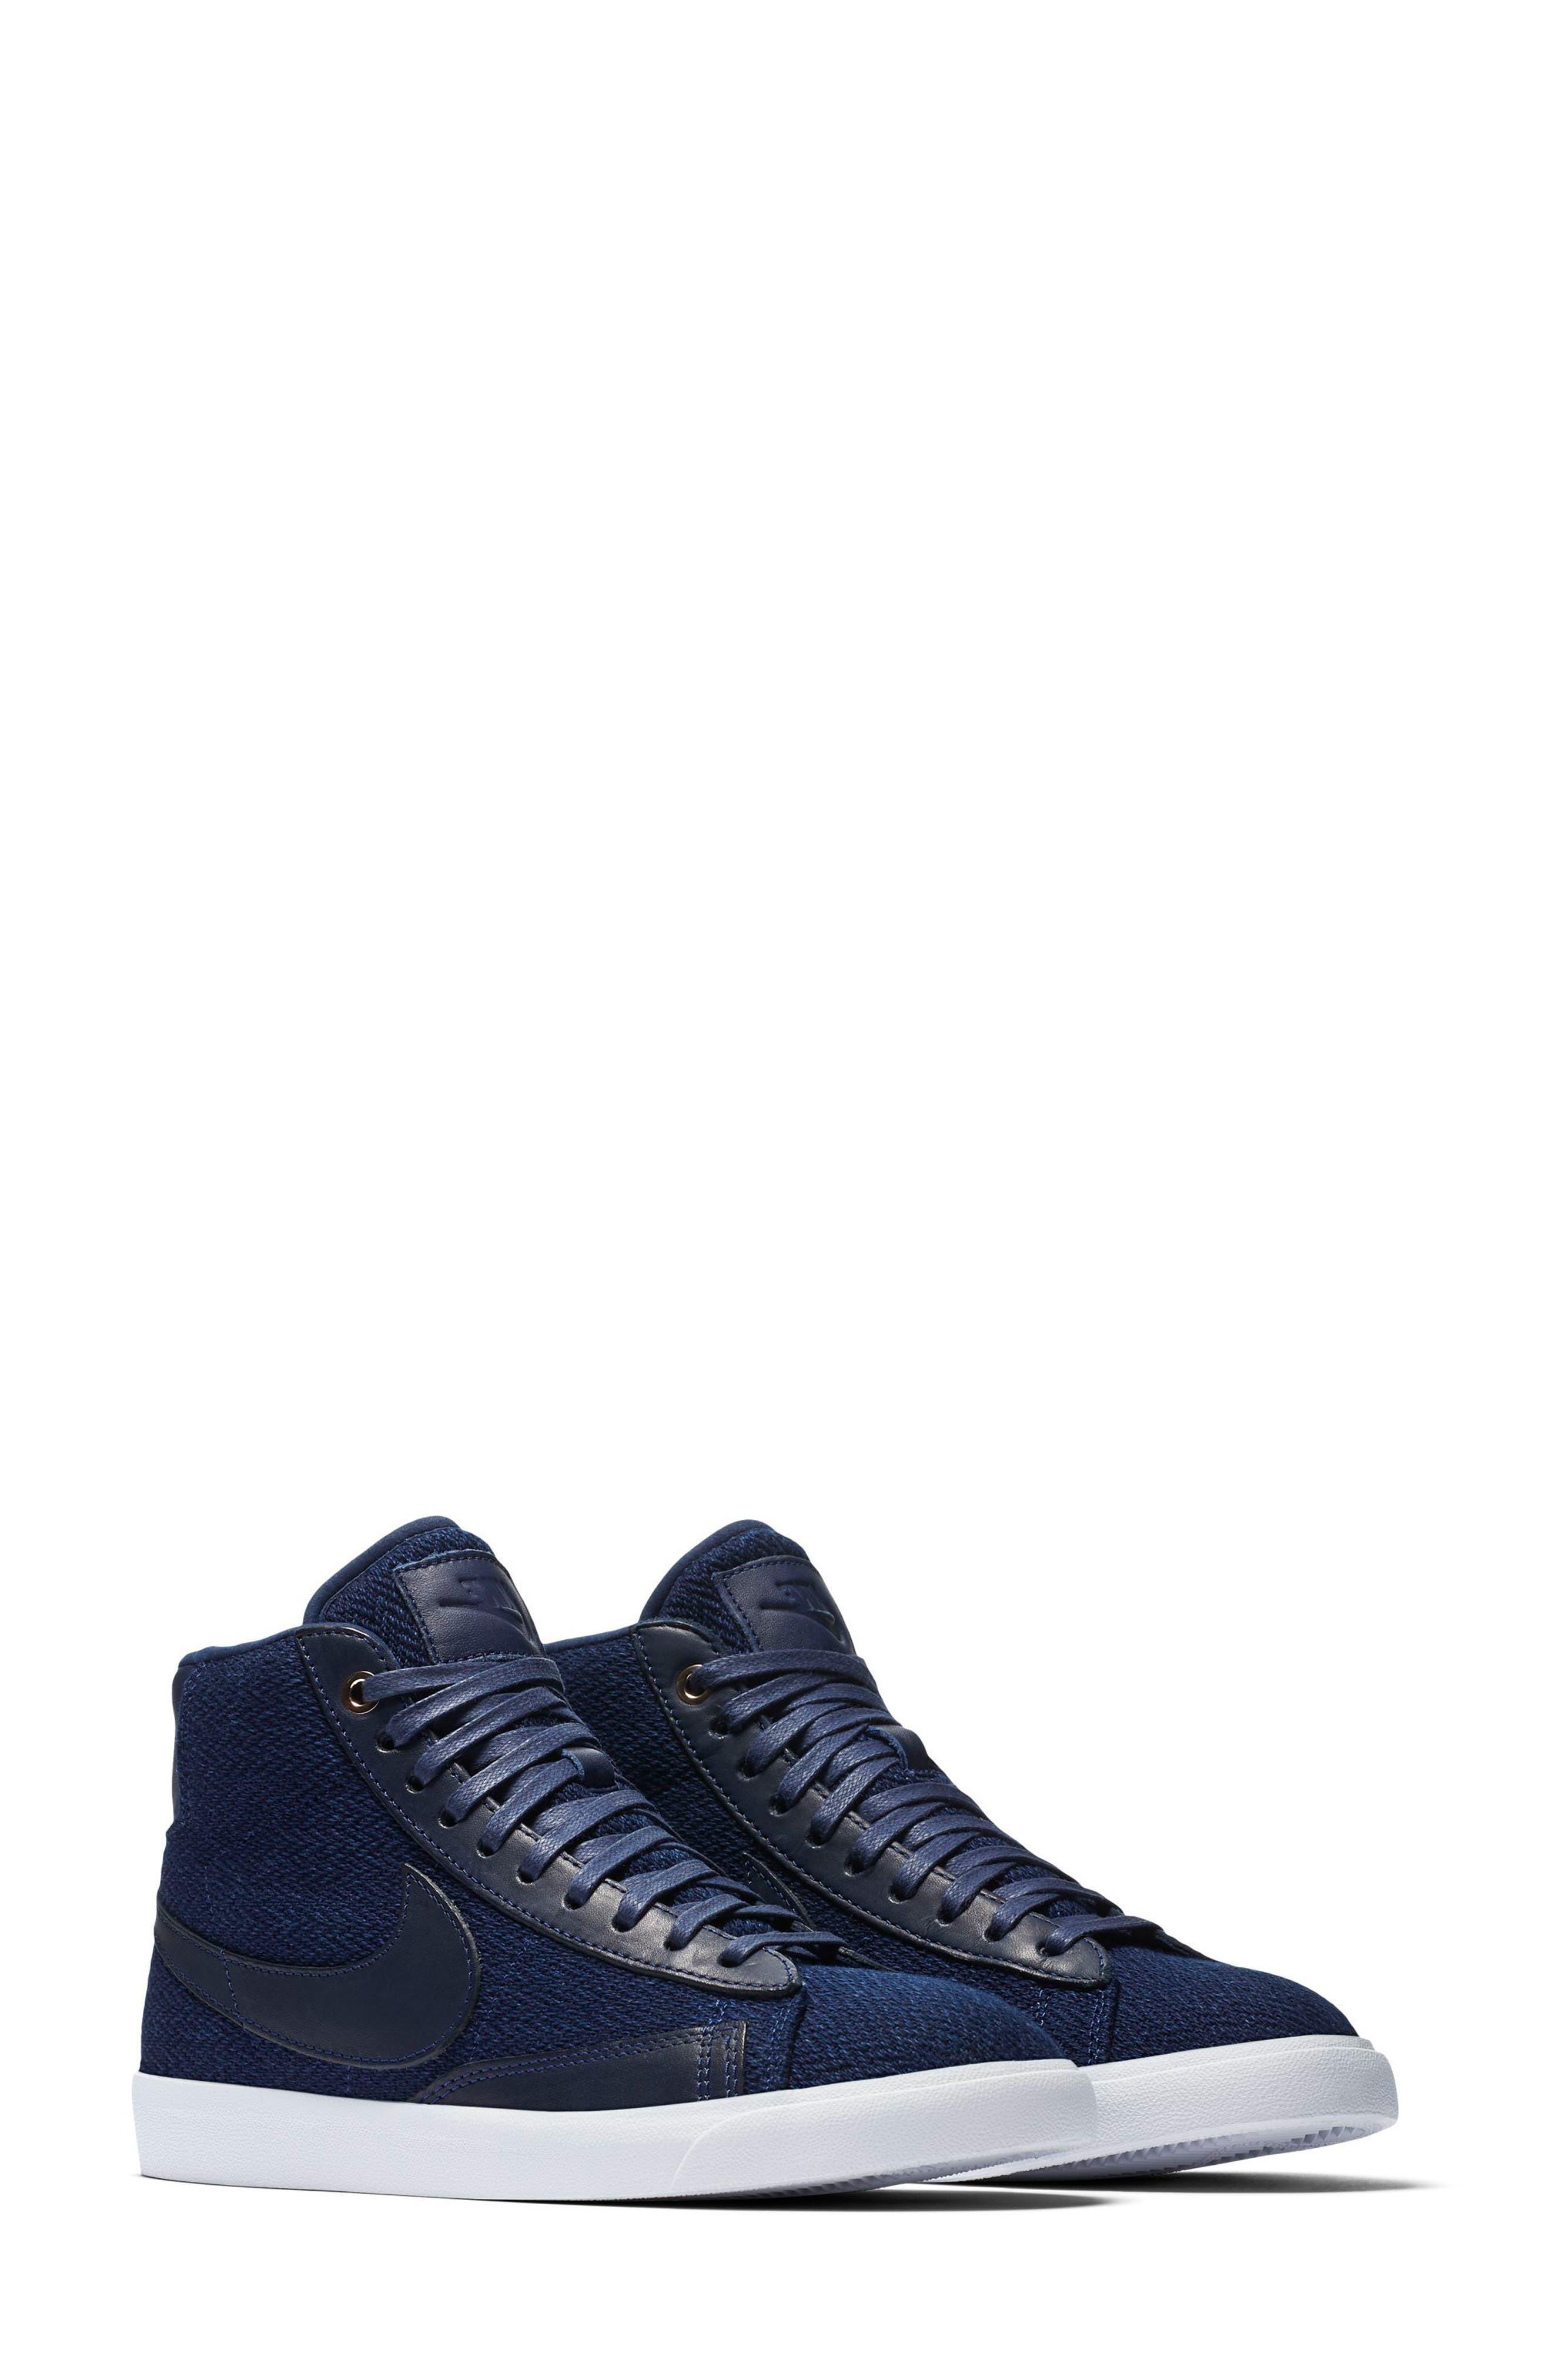 Blazer Mid Premium LX Sneaker,                             Main thumbnail 1, color,                             400